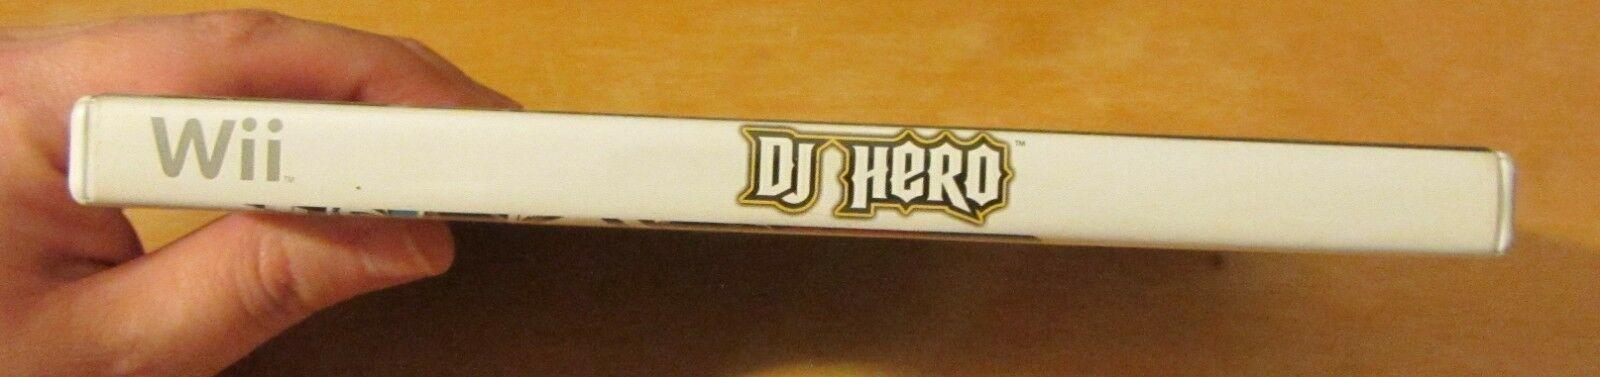 Nintendo Wii DJ Hero Start the Party image 4